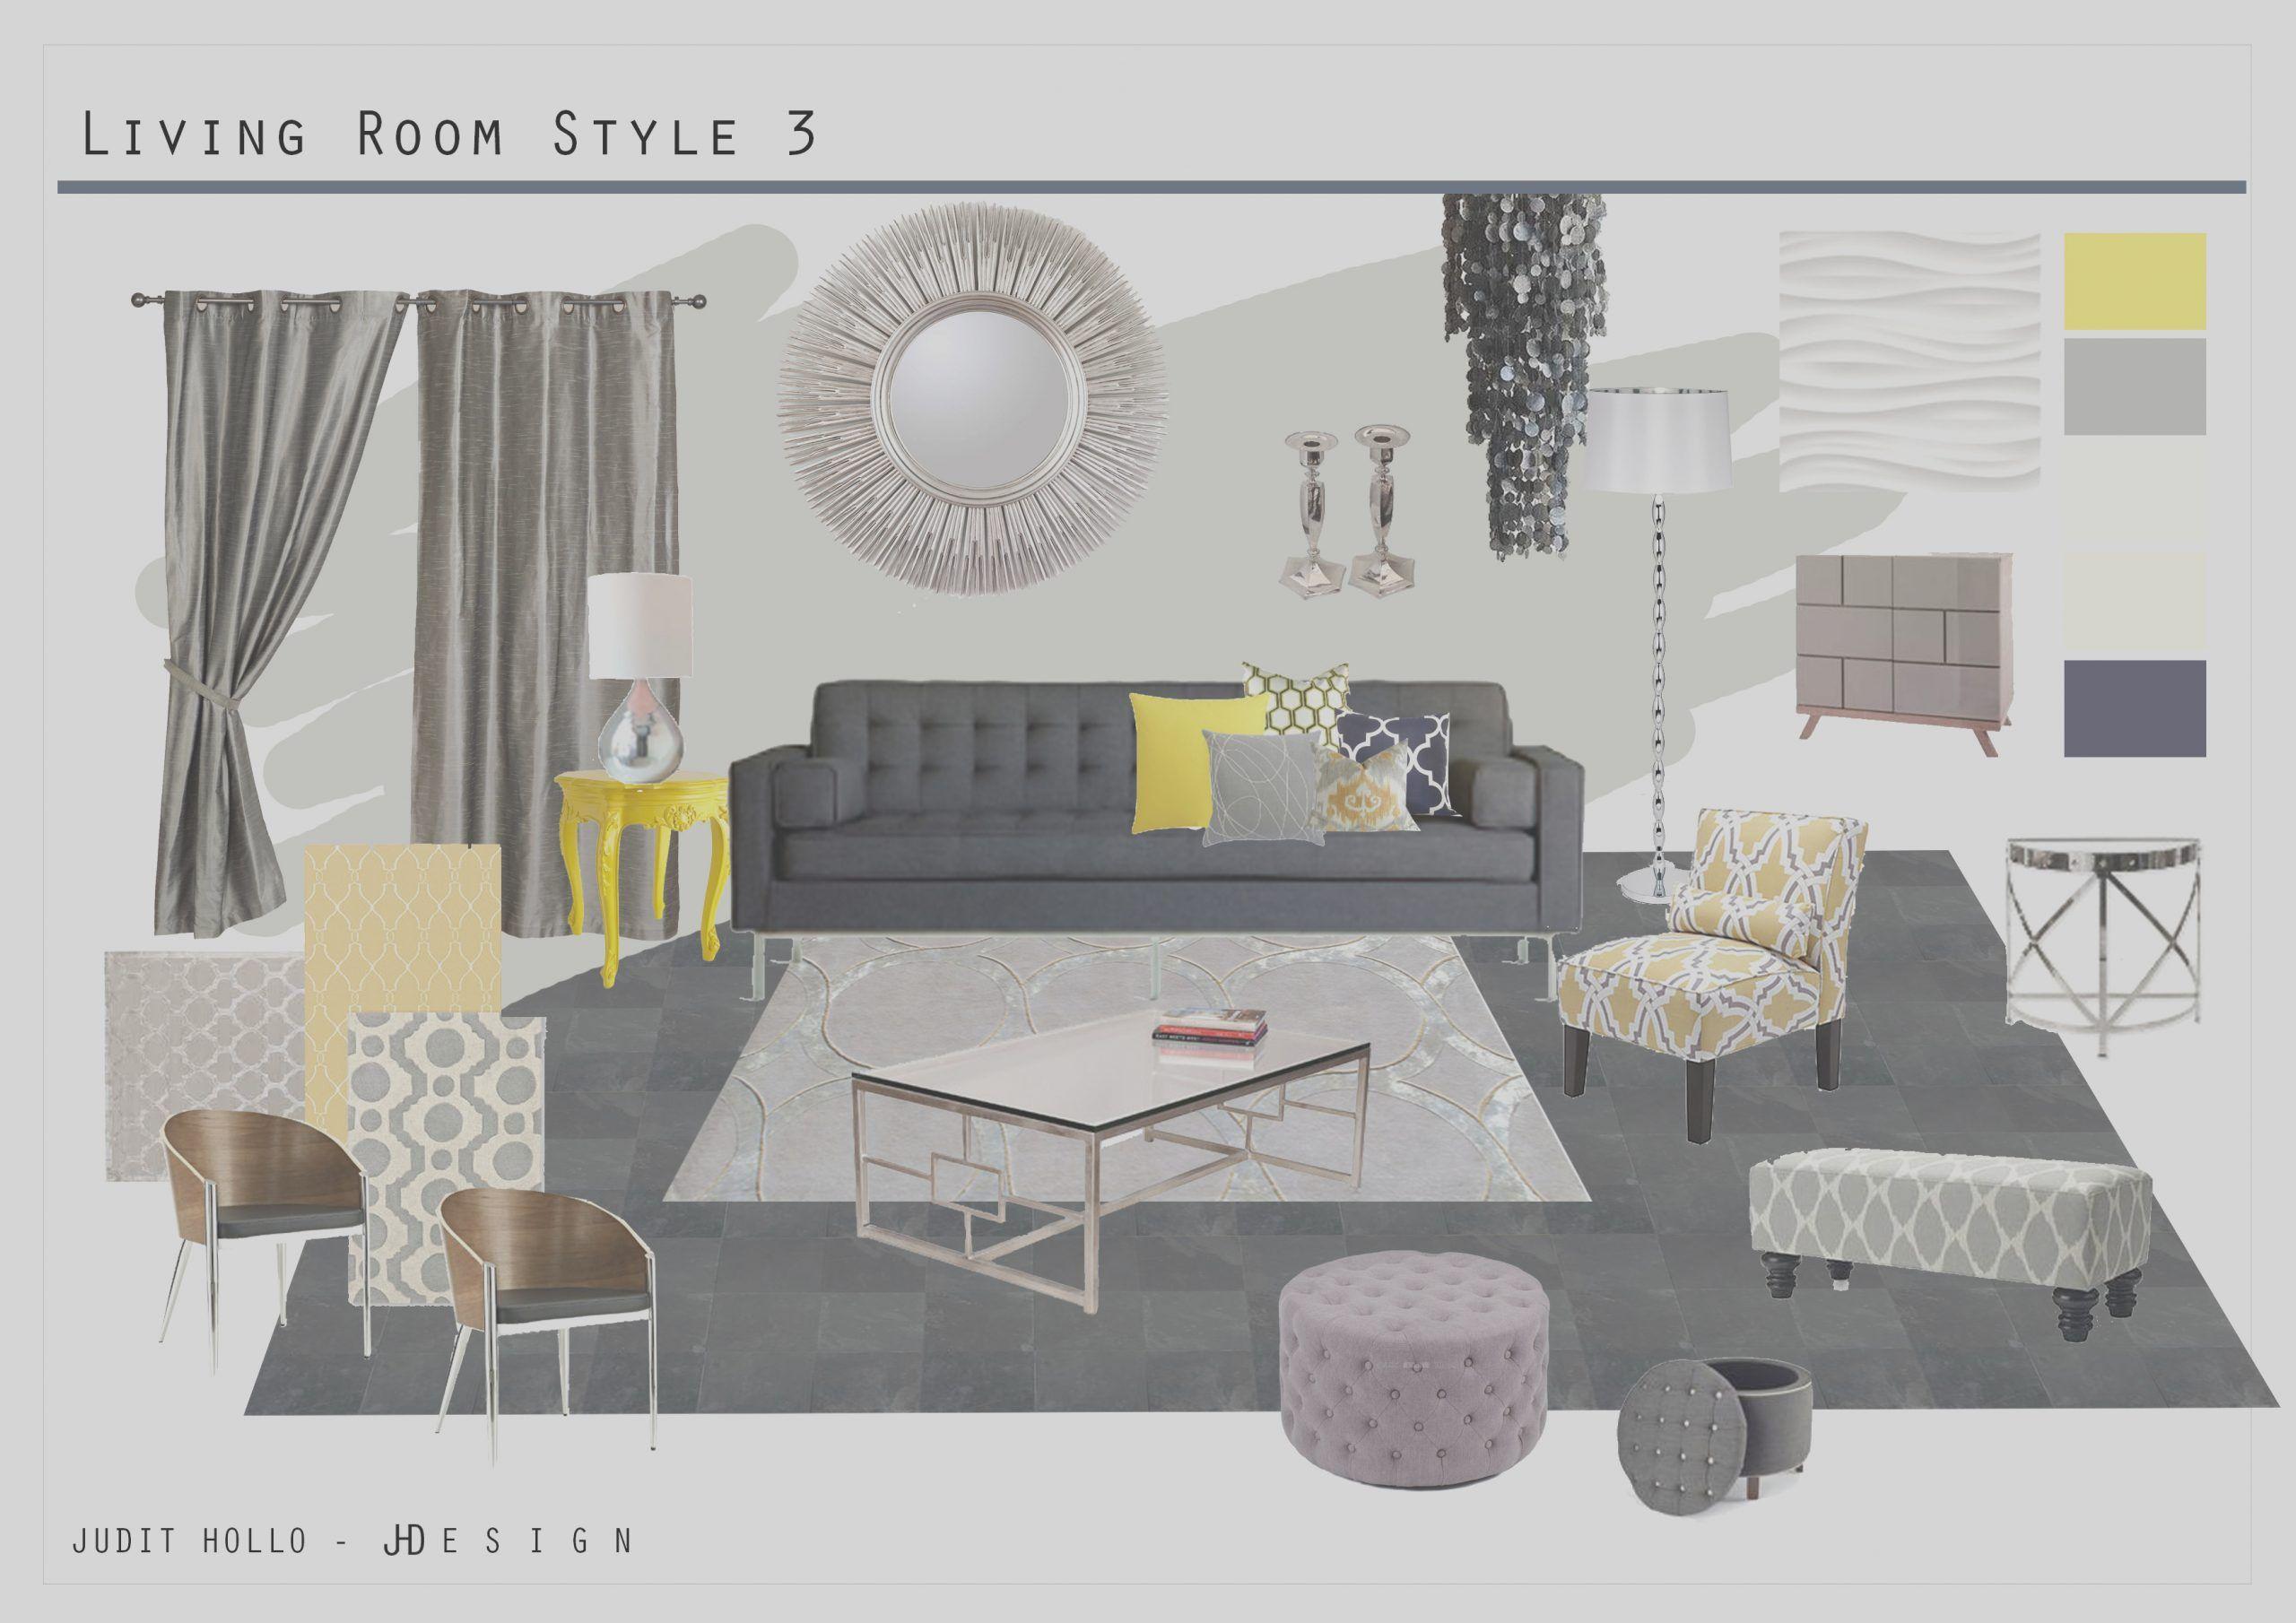 8 Simplistic Living Room Design Board Photos Living Room Design Board Interior Design Mood Board Mood Board Living Room